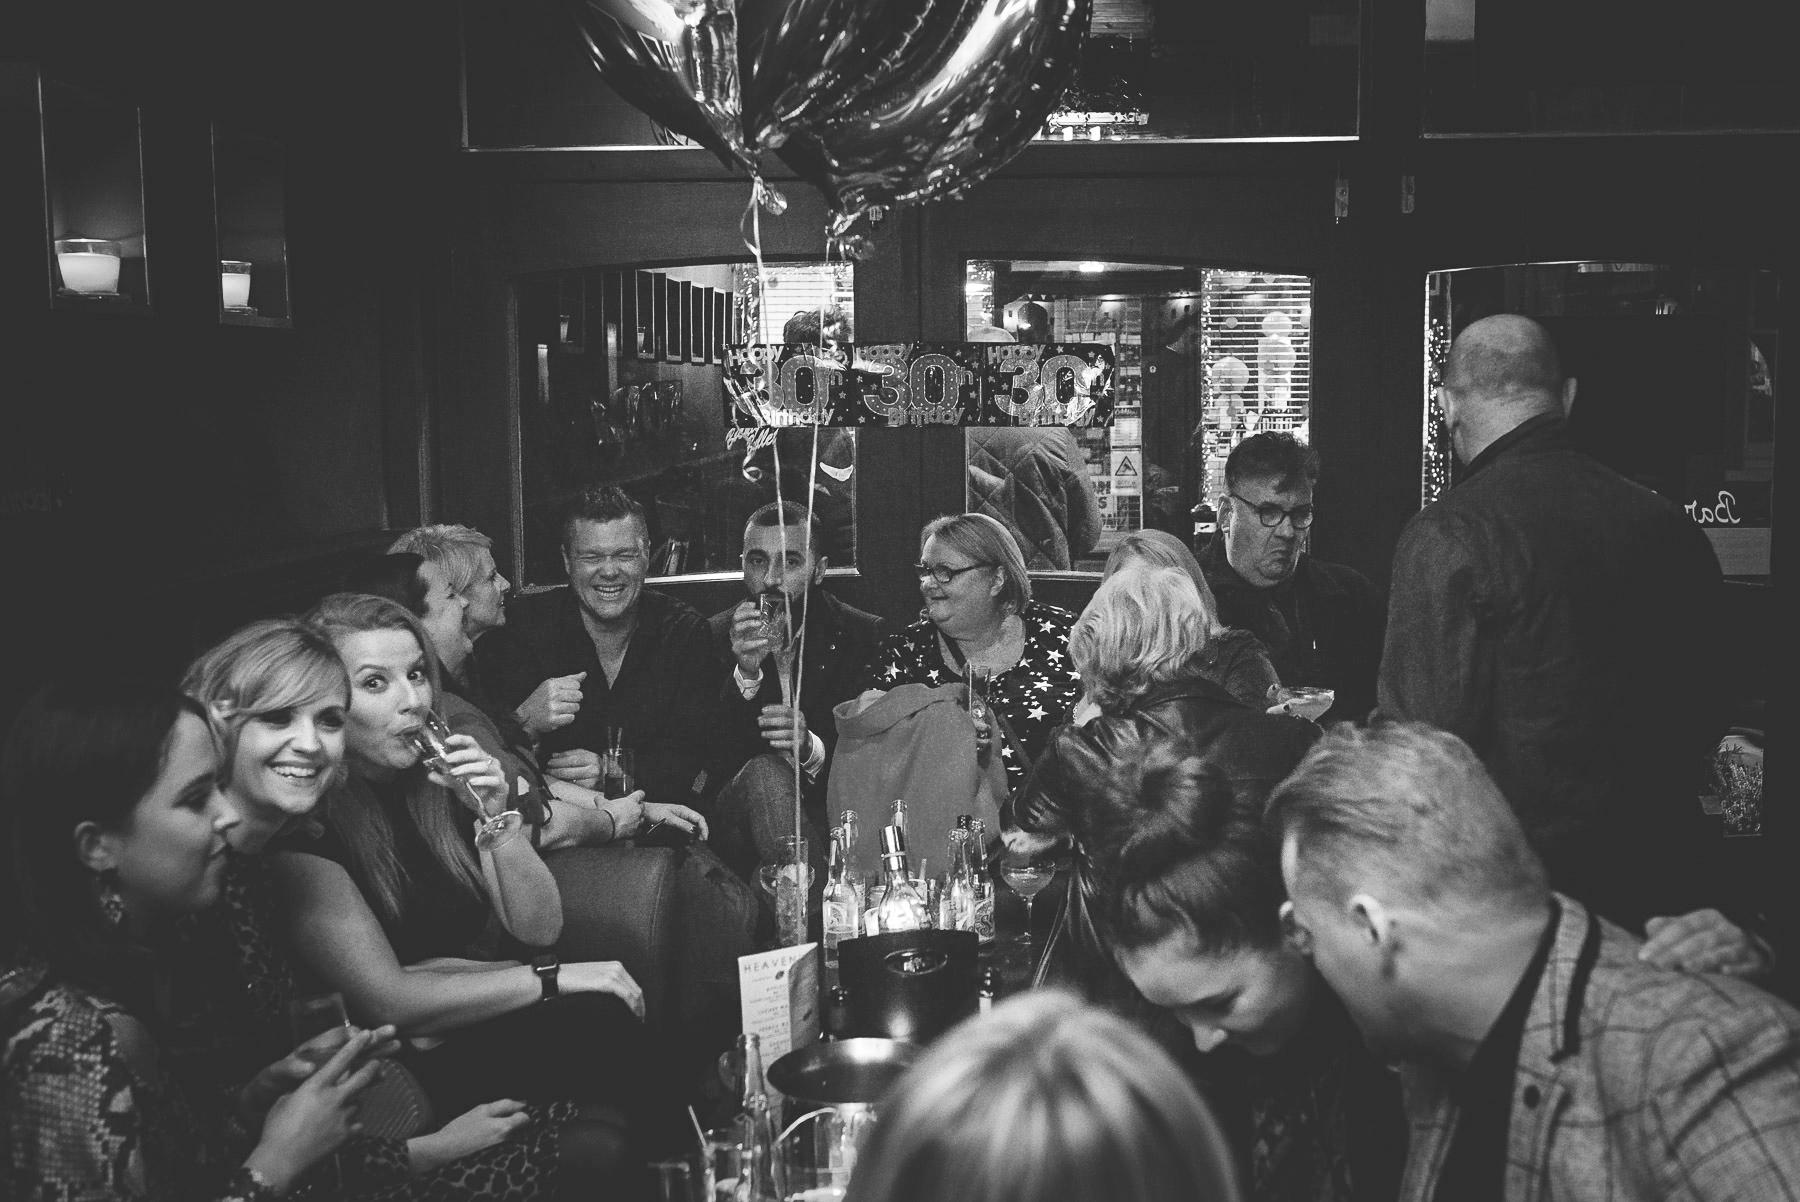 Angels cocktail bar Oxford_24.11.2018_904.jpg